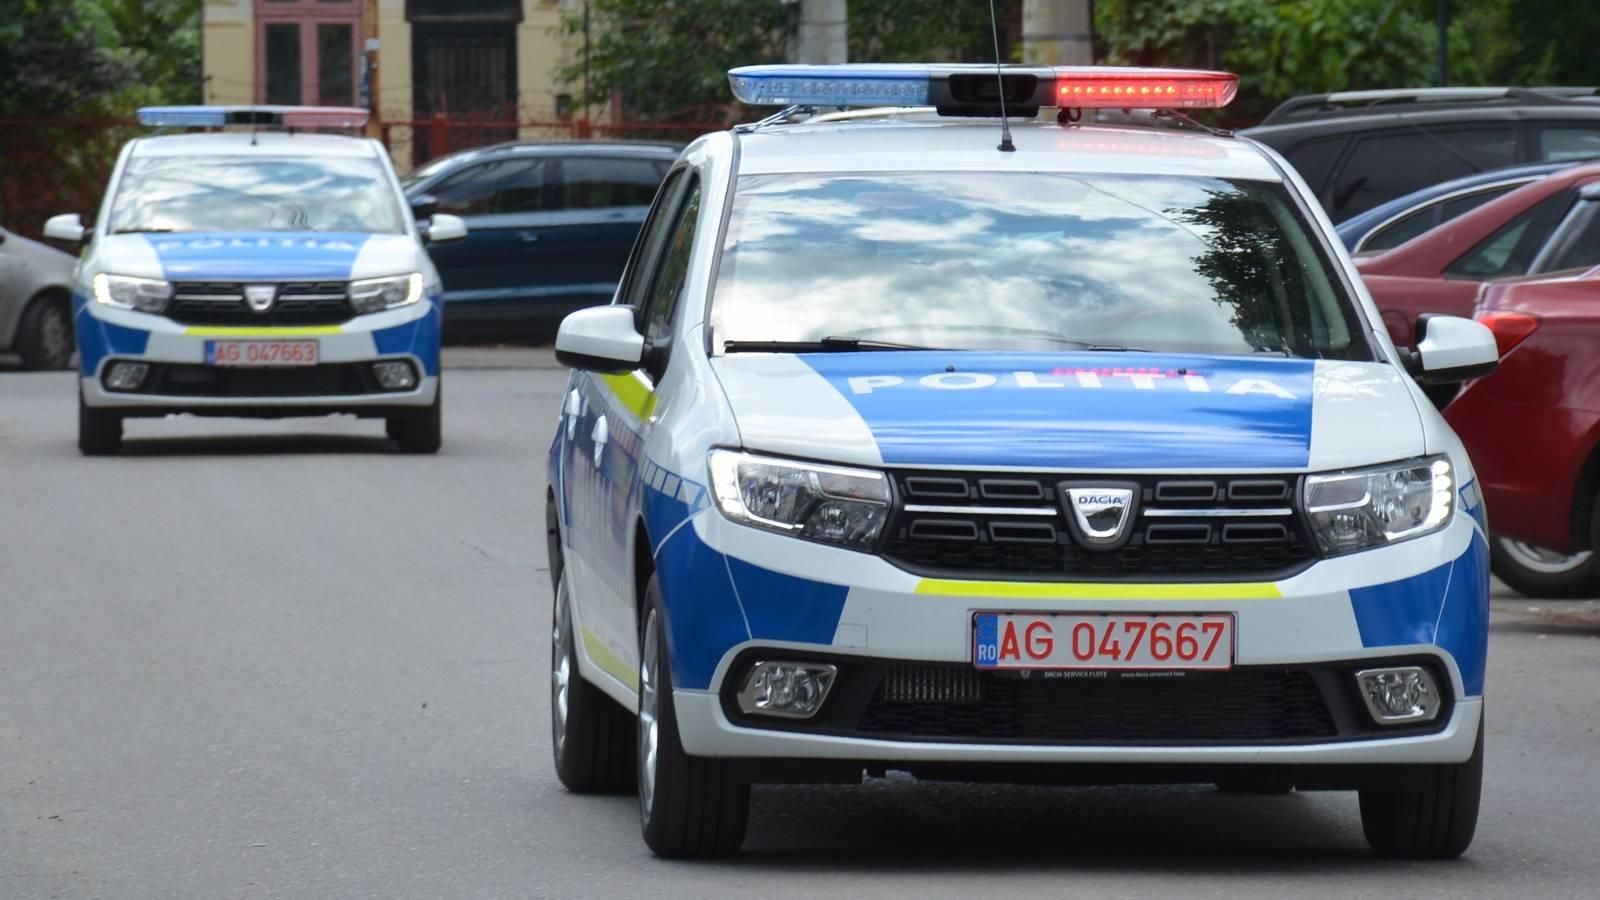 politia romana decindere live facebook